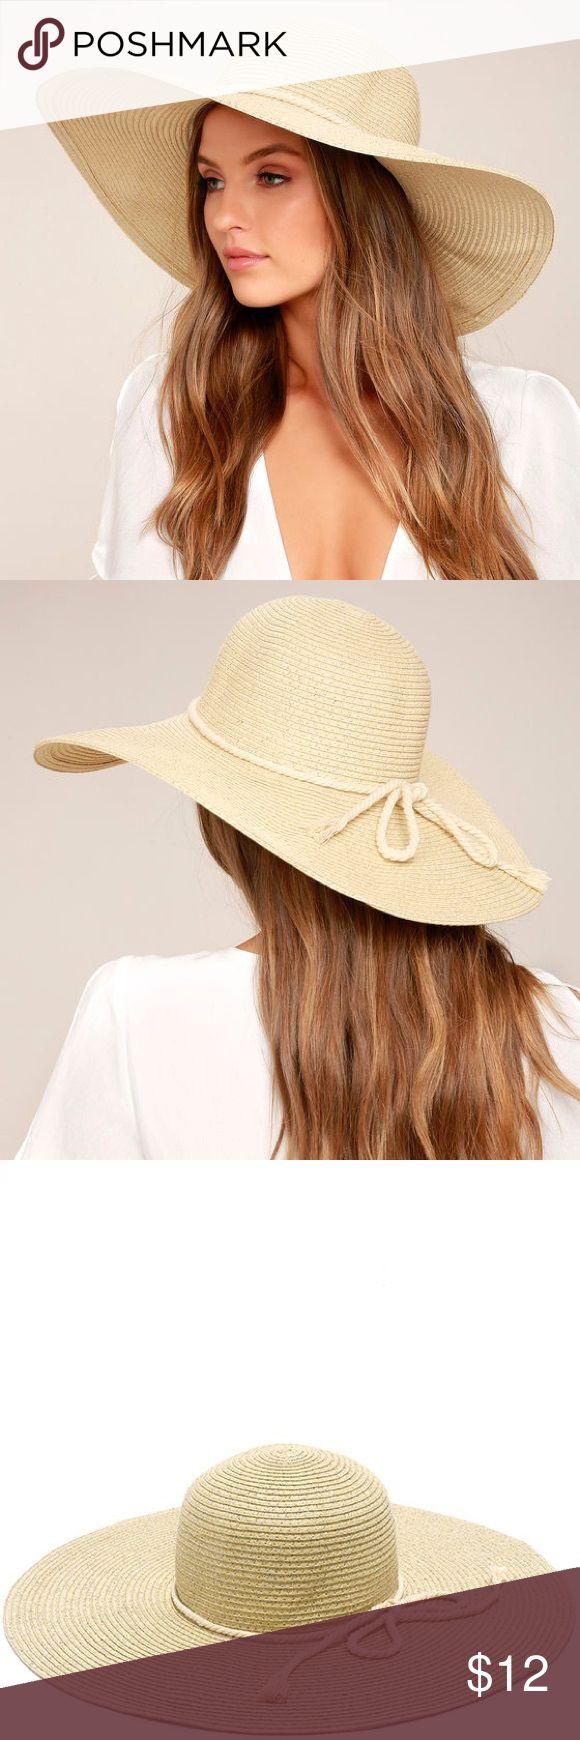 best 25+ floppy straw hat ideas on pinterest | floppy summer hats